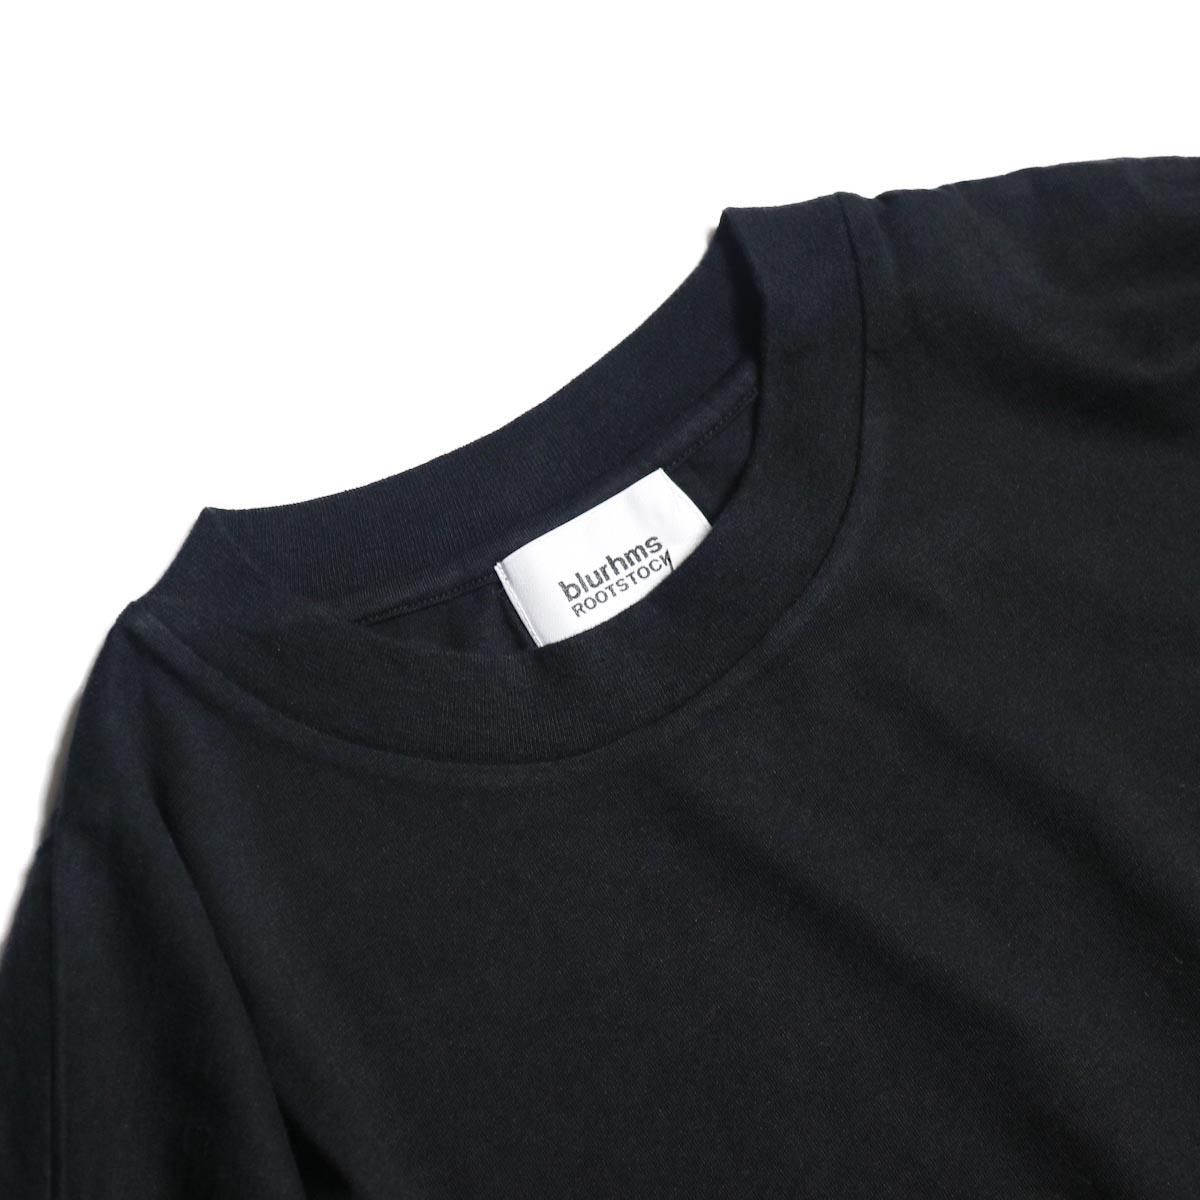 blurhms / Silk Cotton Jersey L/S P/O Loose Fit (Black)クルーネック